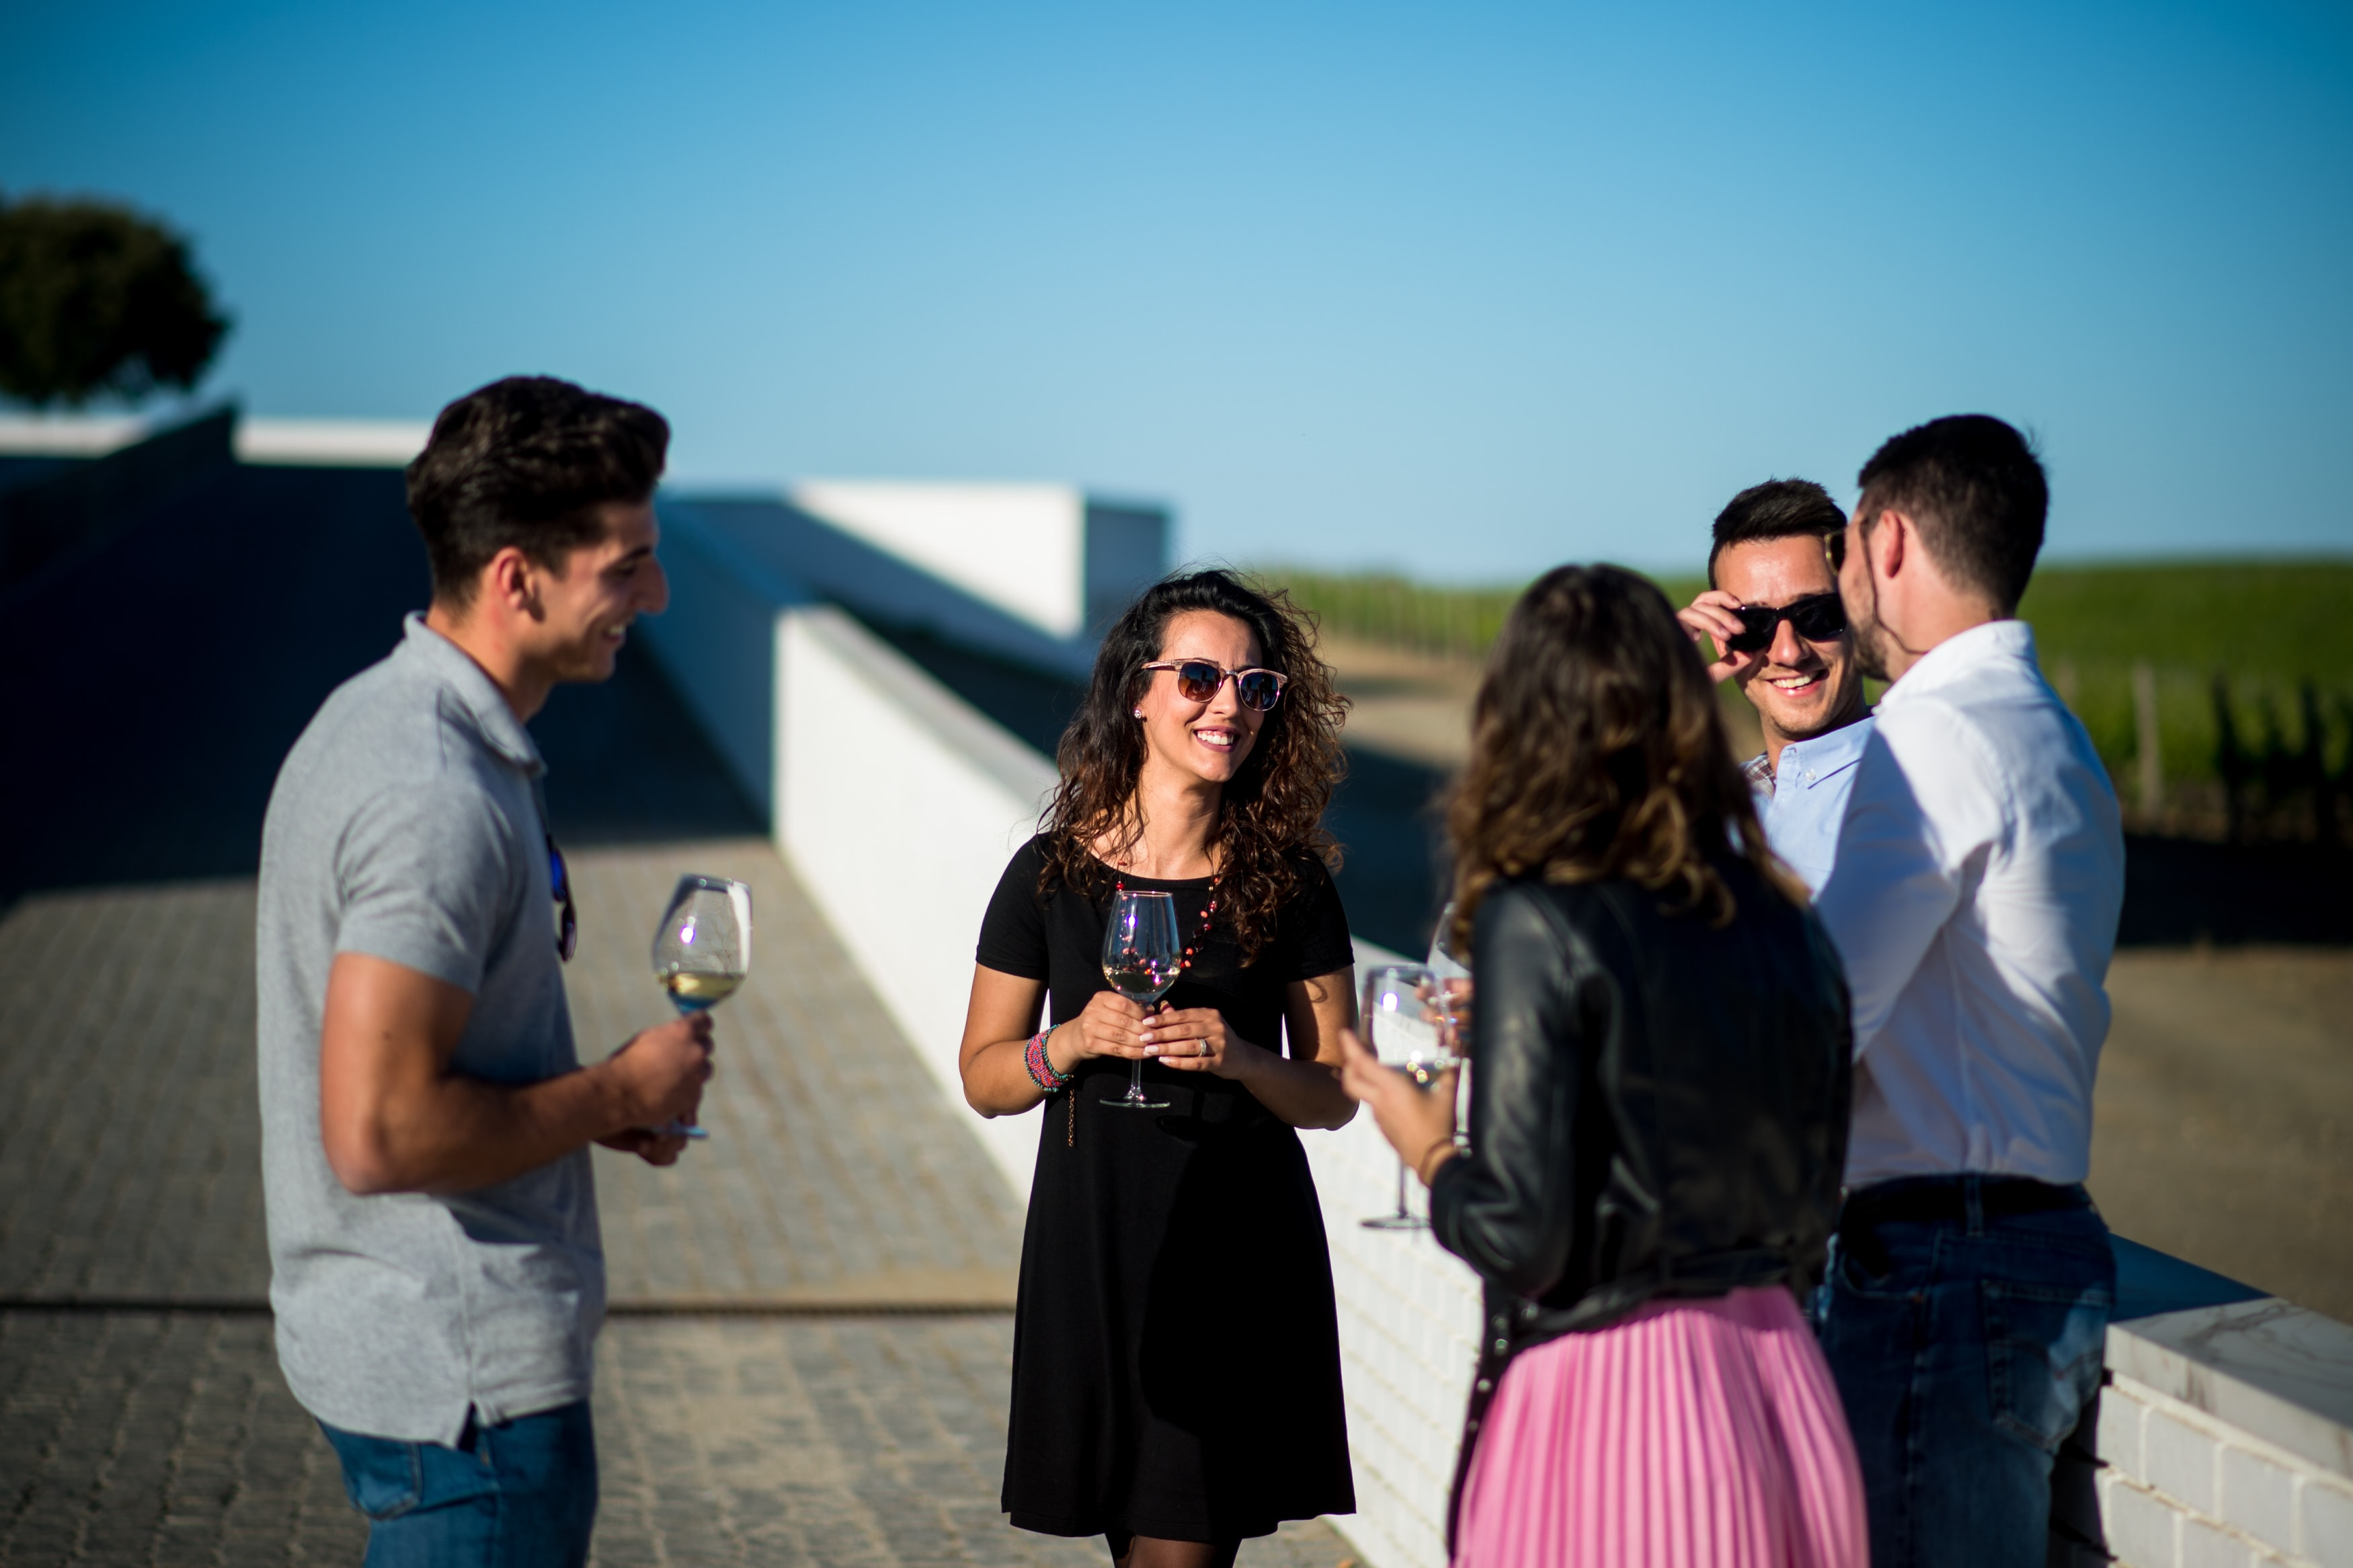 Adega Mayor - Workshop Vínico